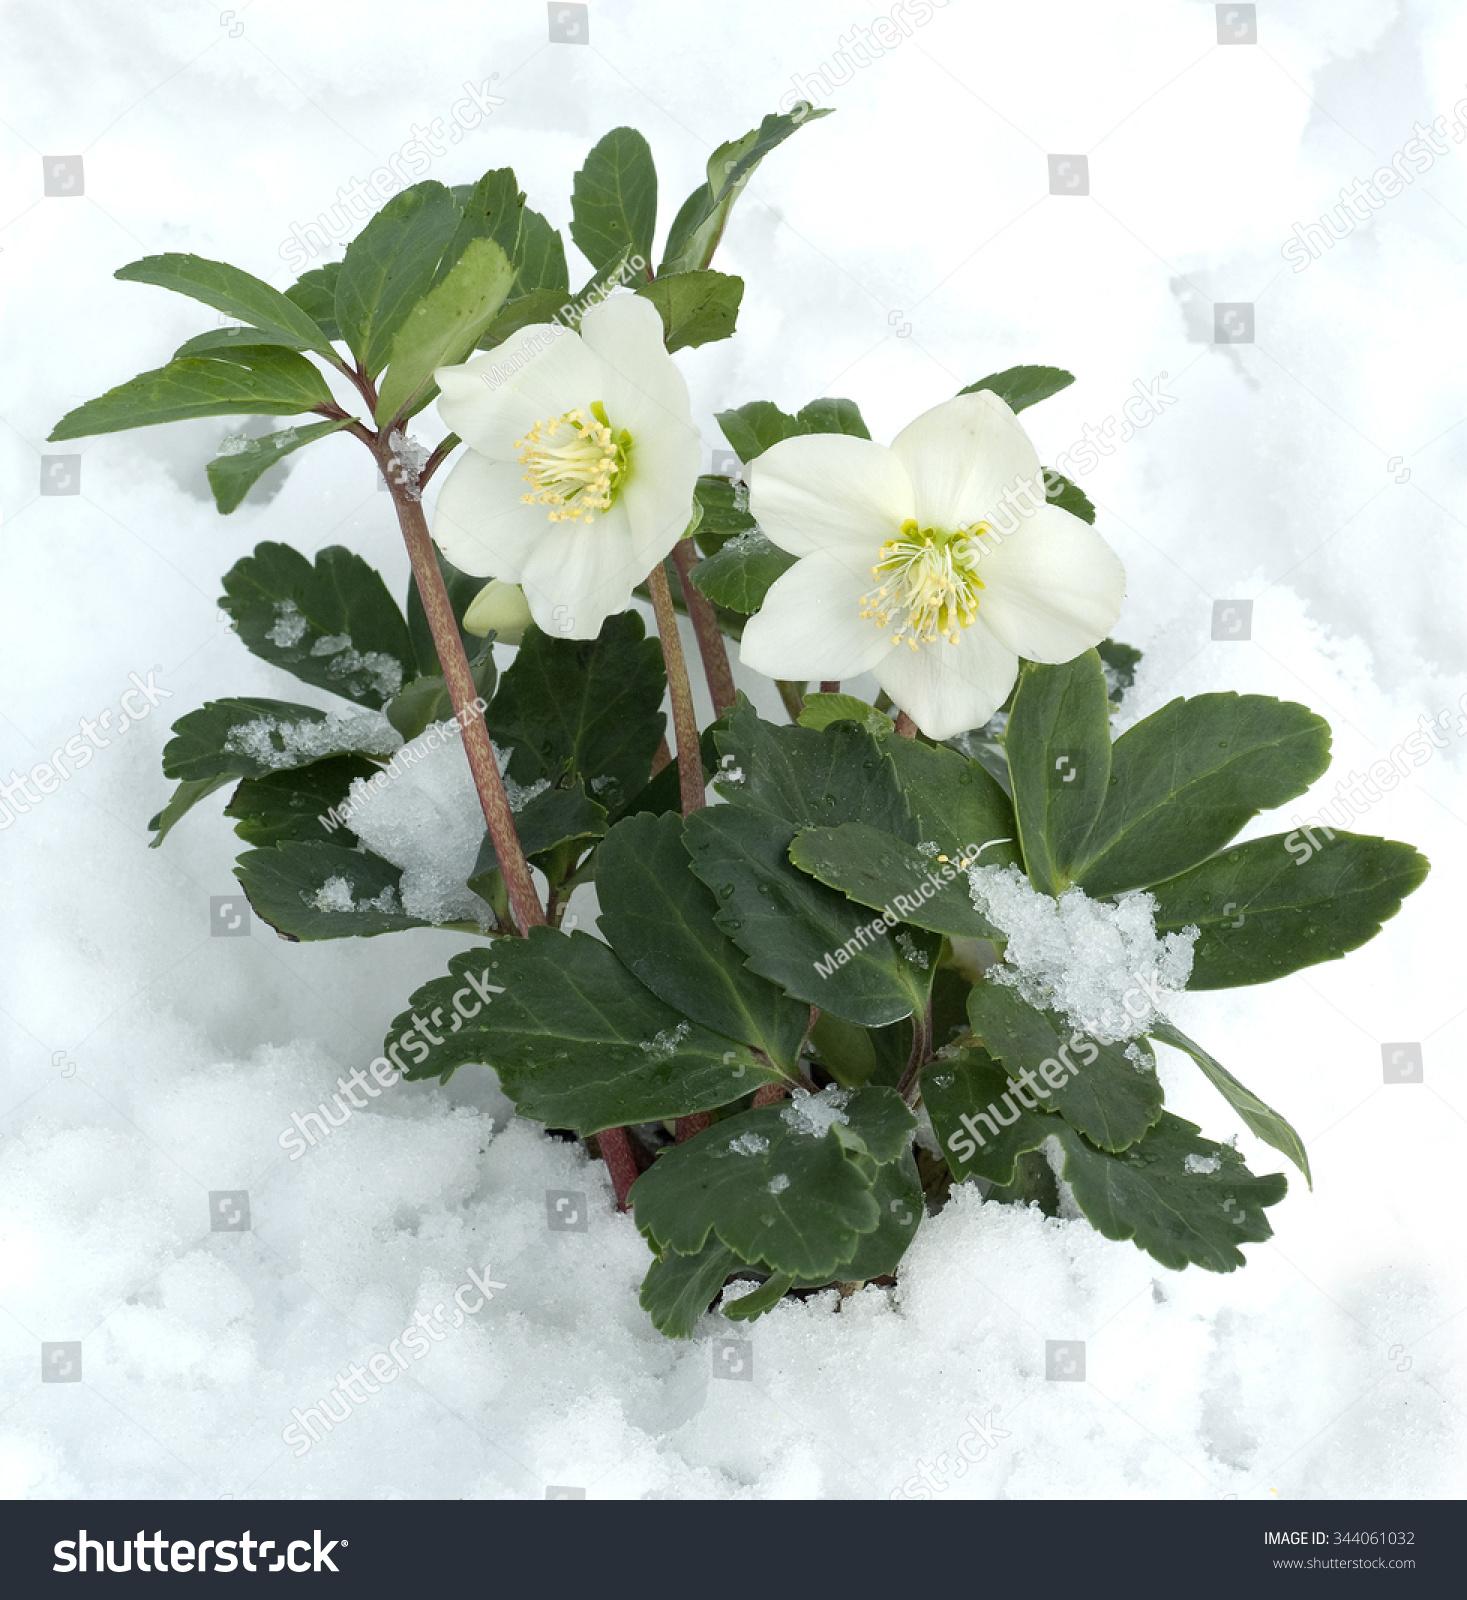 christmas rose helleborus niger stock photo 344061032 shutterstock. Black Bedroom Furniture Sets. Home Design Ideas